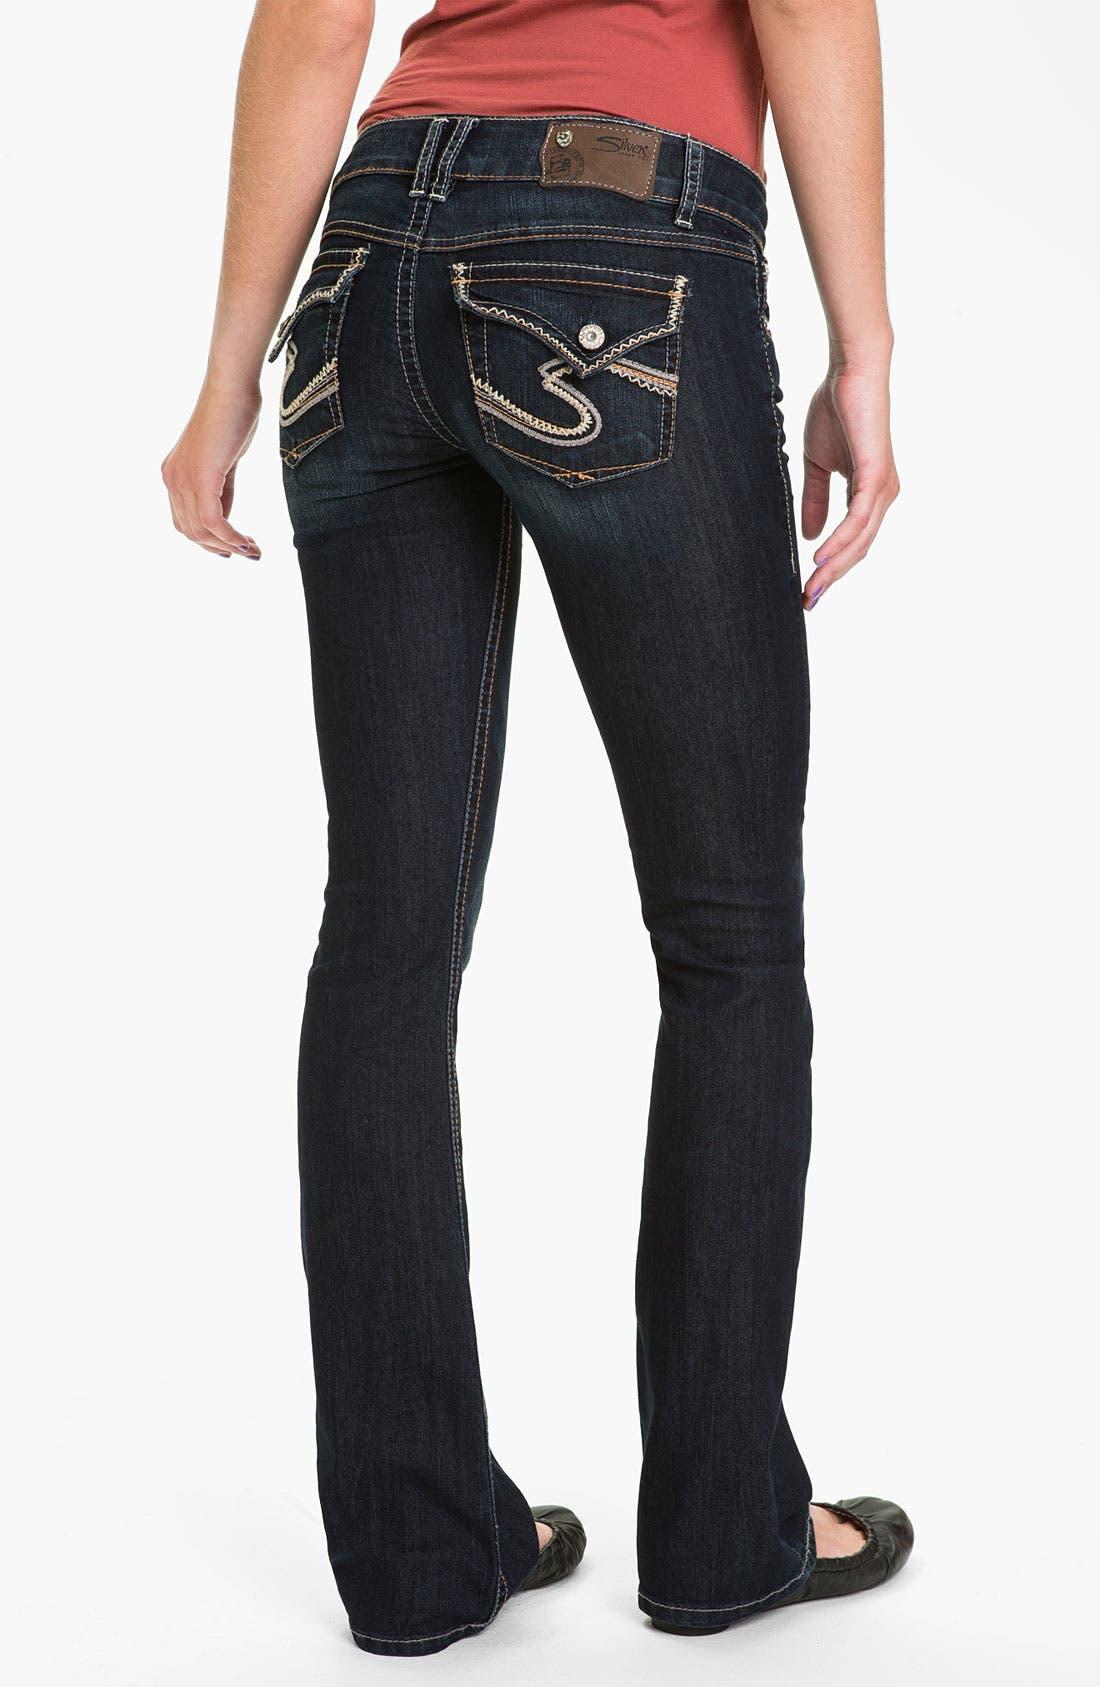 Main Image - Silver Jeans Co. 'Dawson' Flare Leg Jeans (Juniors)